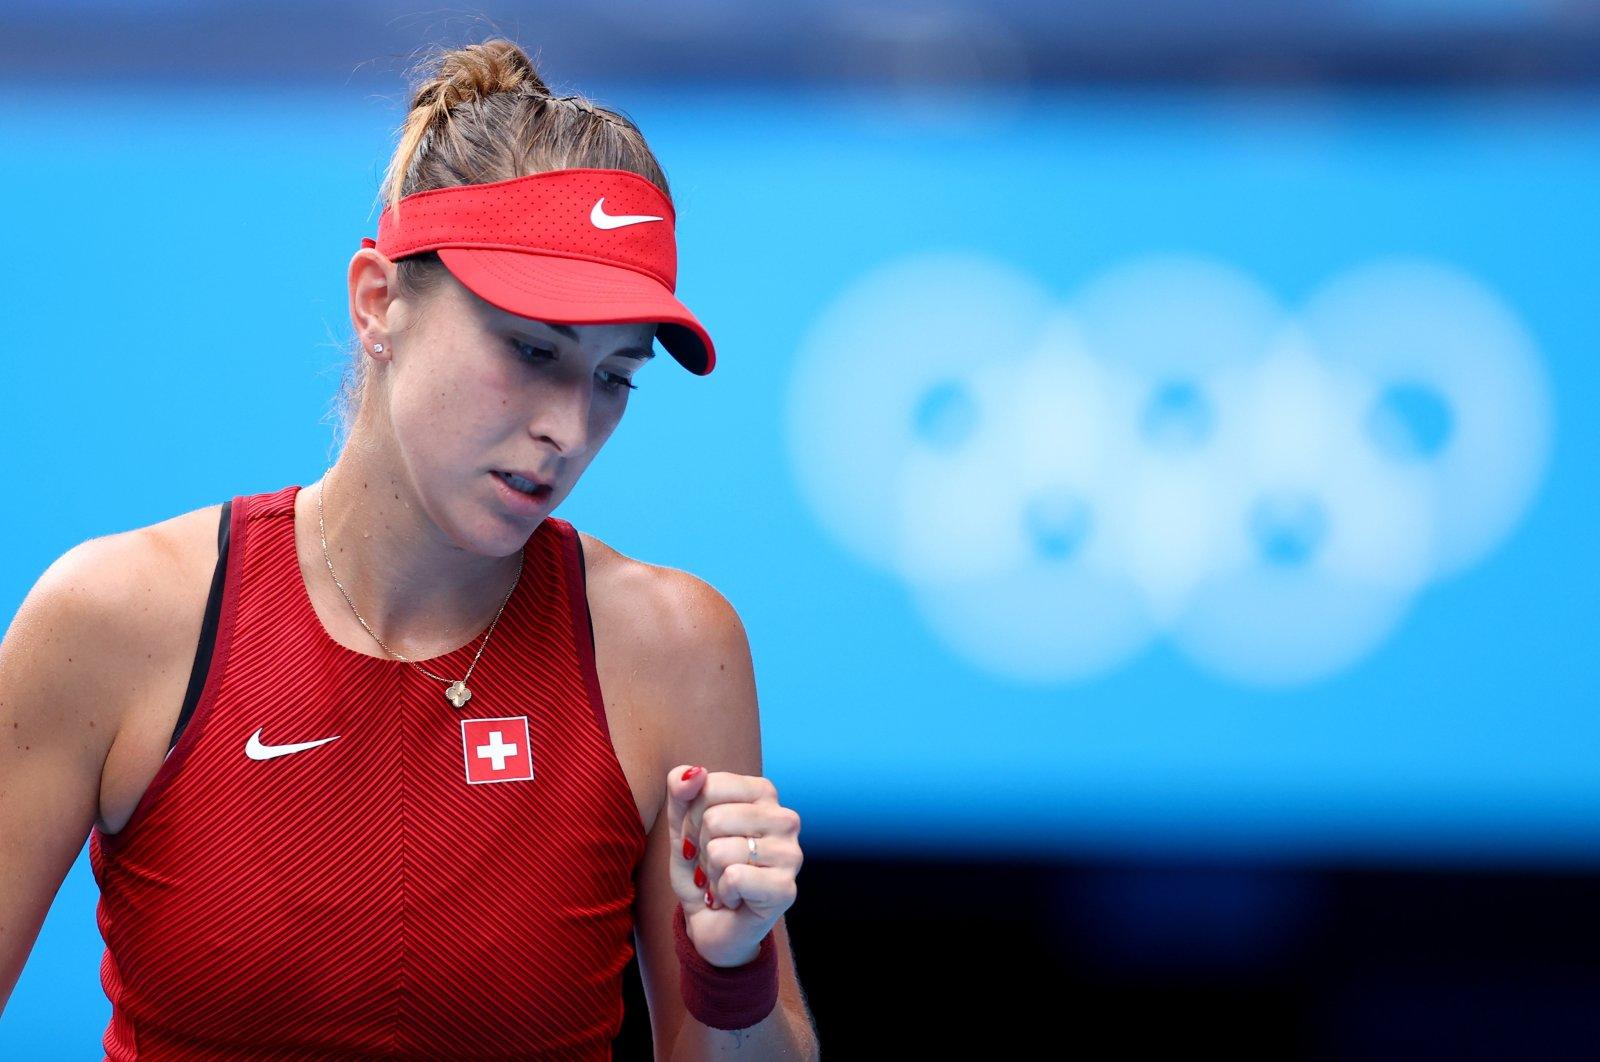 Switzerland's Belinda Bencic reacts during her Tokyo 2020 Olympics tennis women's singles semifinal match against Kazakhstan's Elena Rybakina at Ariake Tennis Park, Tokyo, Japan, July 29, 2021.